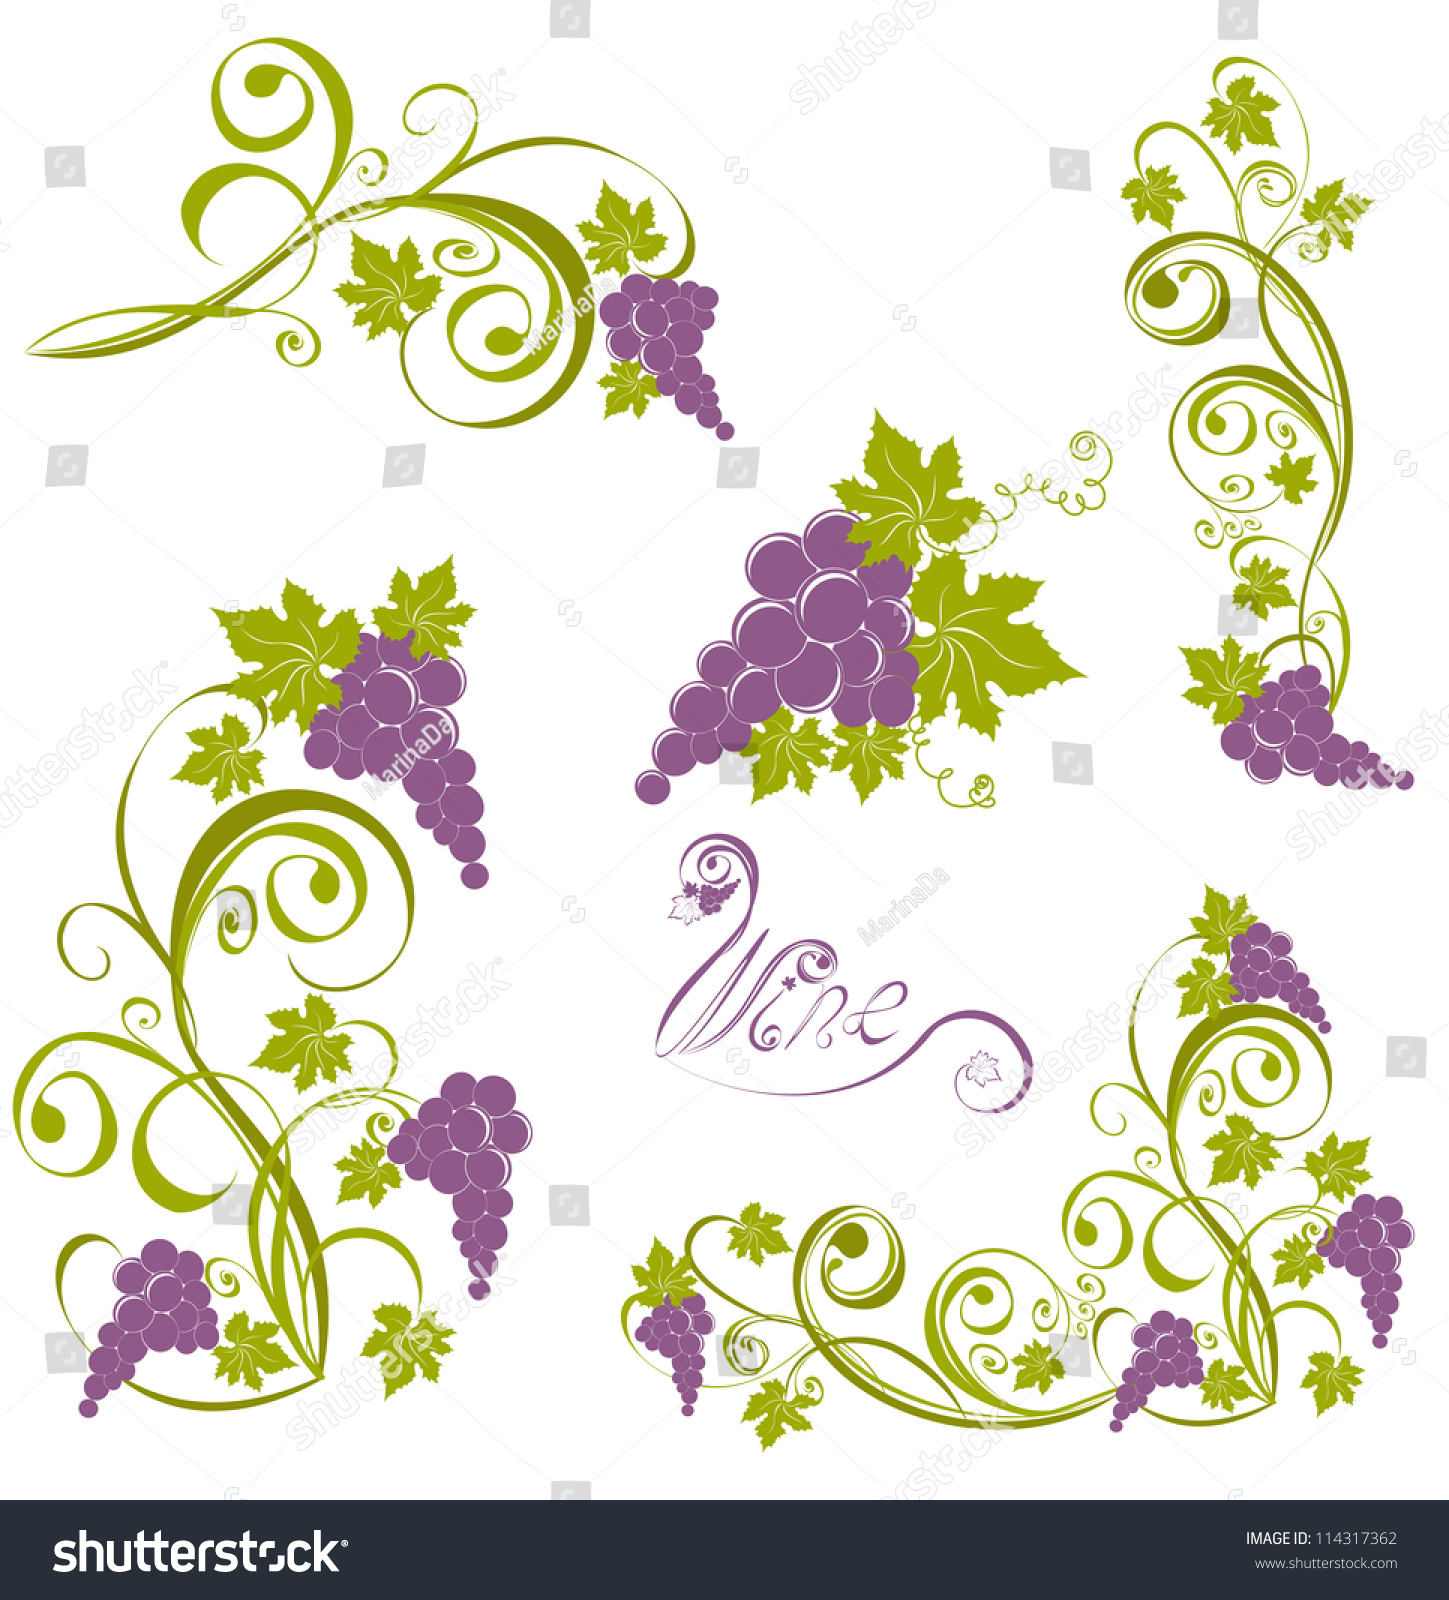 Grapevine. Vector Wine Design Elements - 114317362 ...